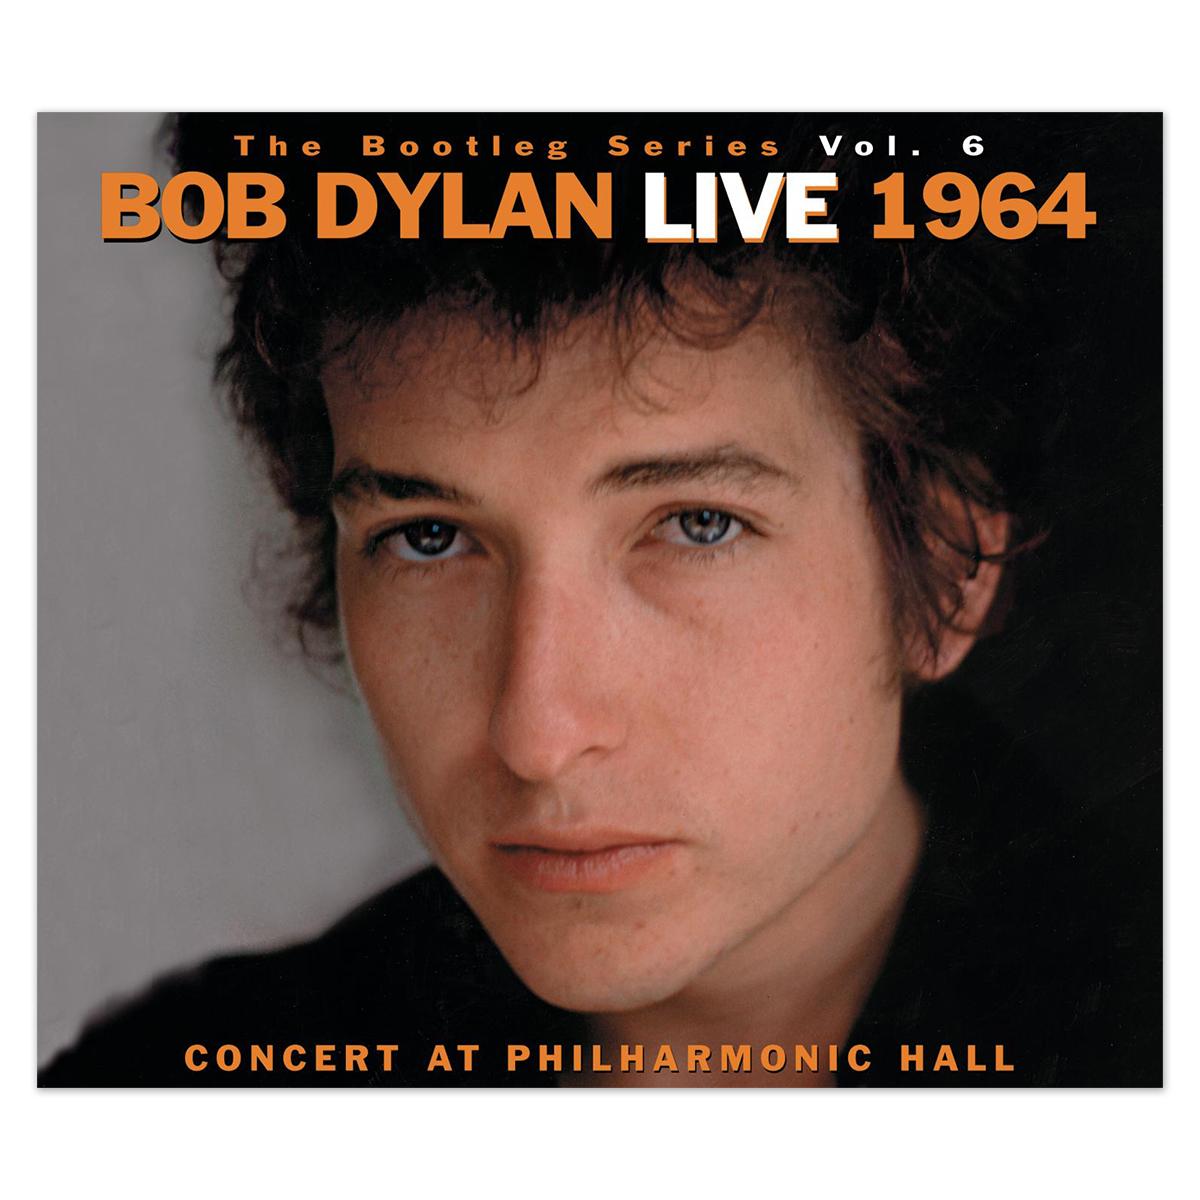 The Bootleg Series, Vol 6: Bob Dylan Live 1964 CD